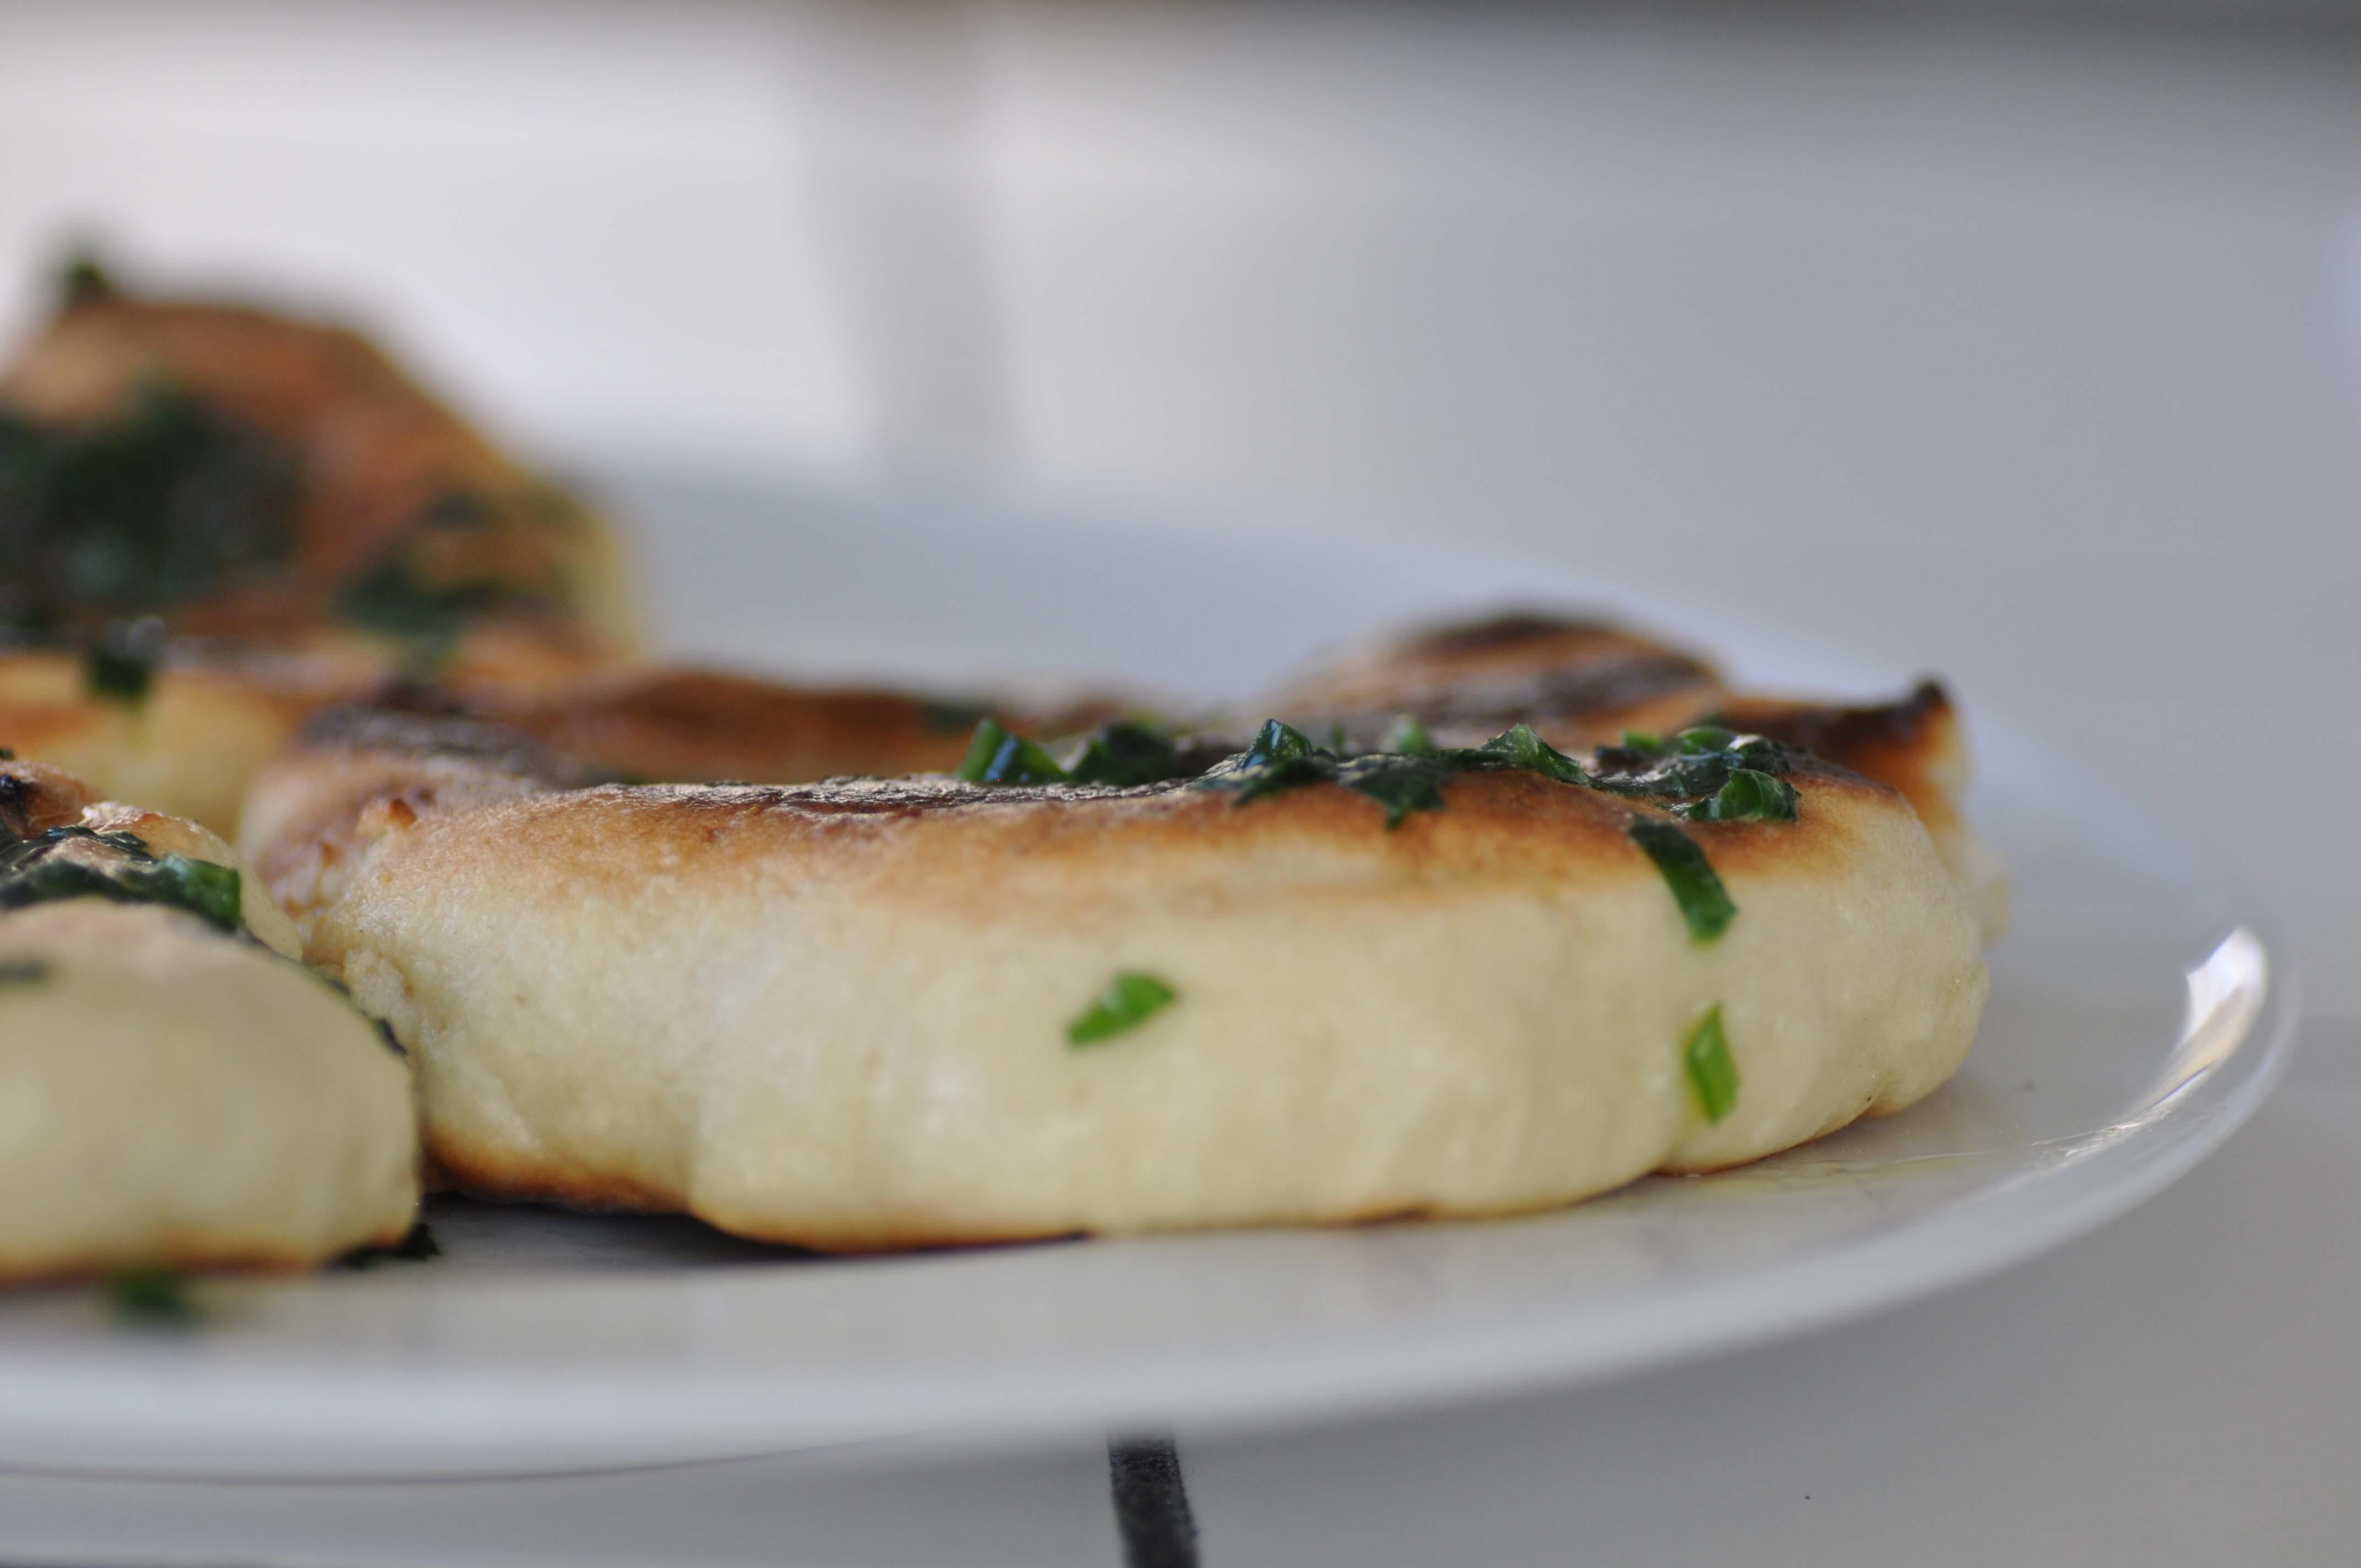 bears garlic flat bread II_bearbeitet-1